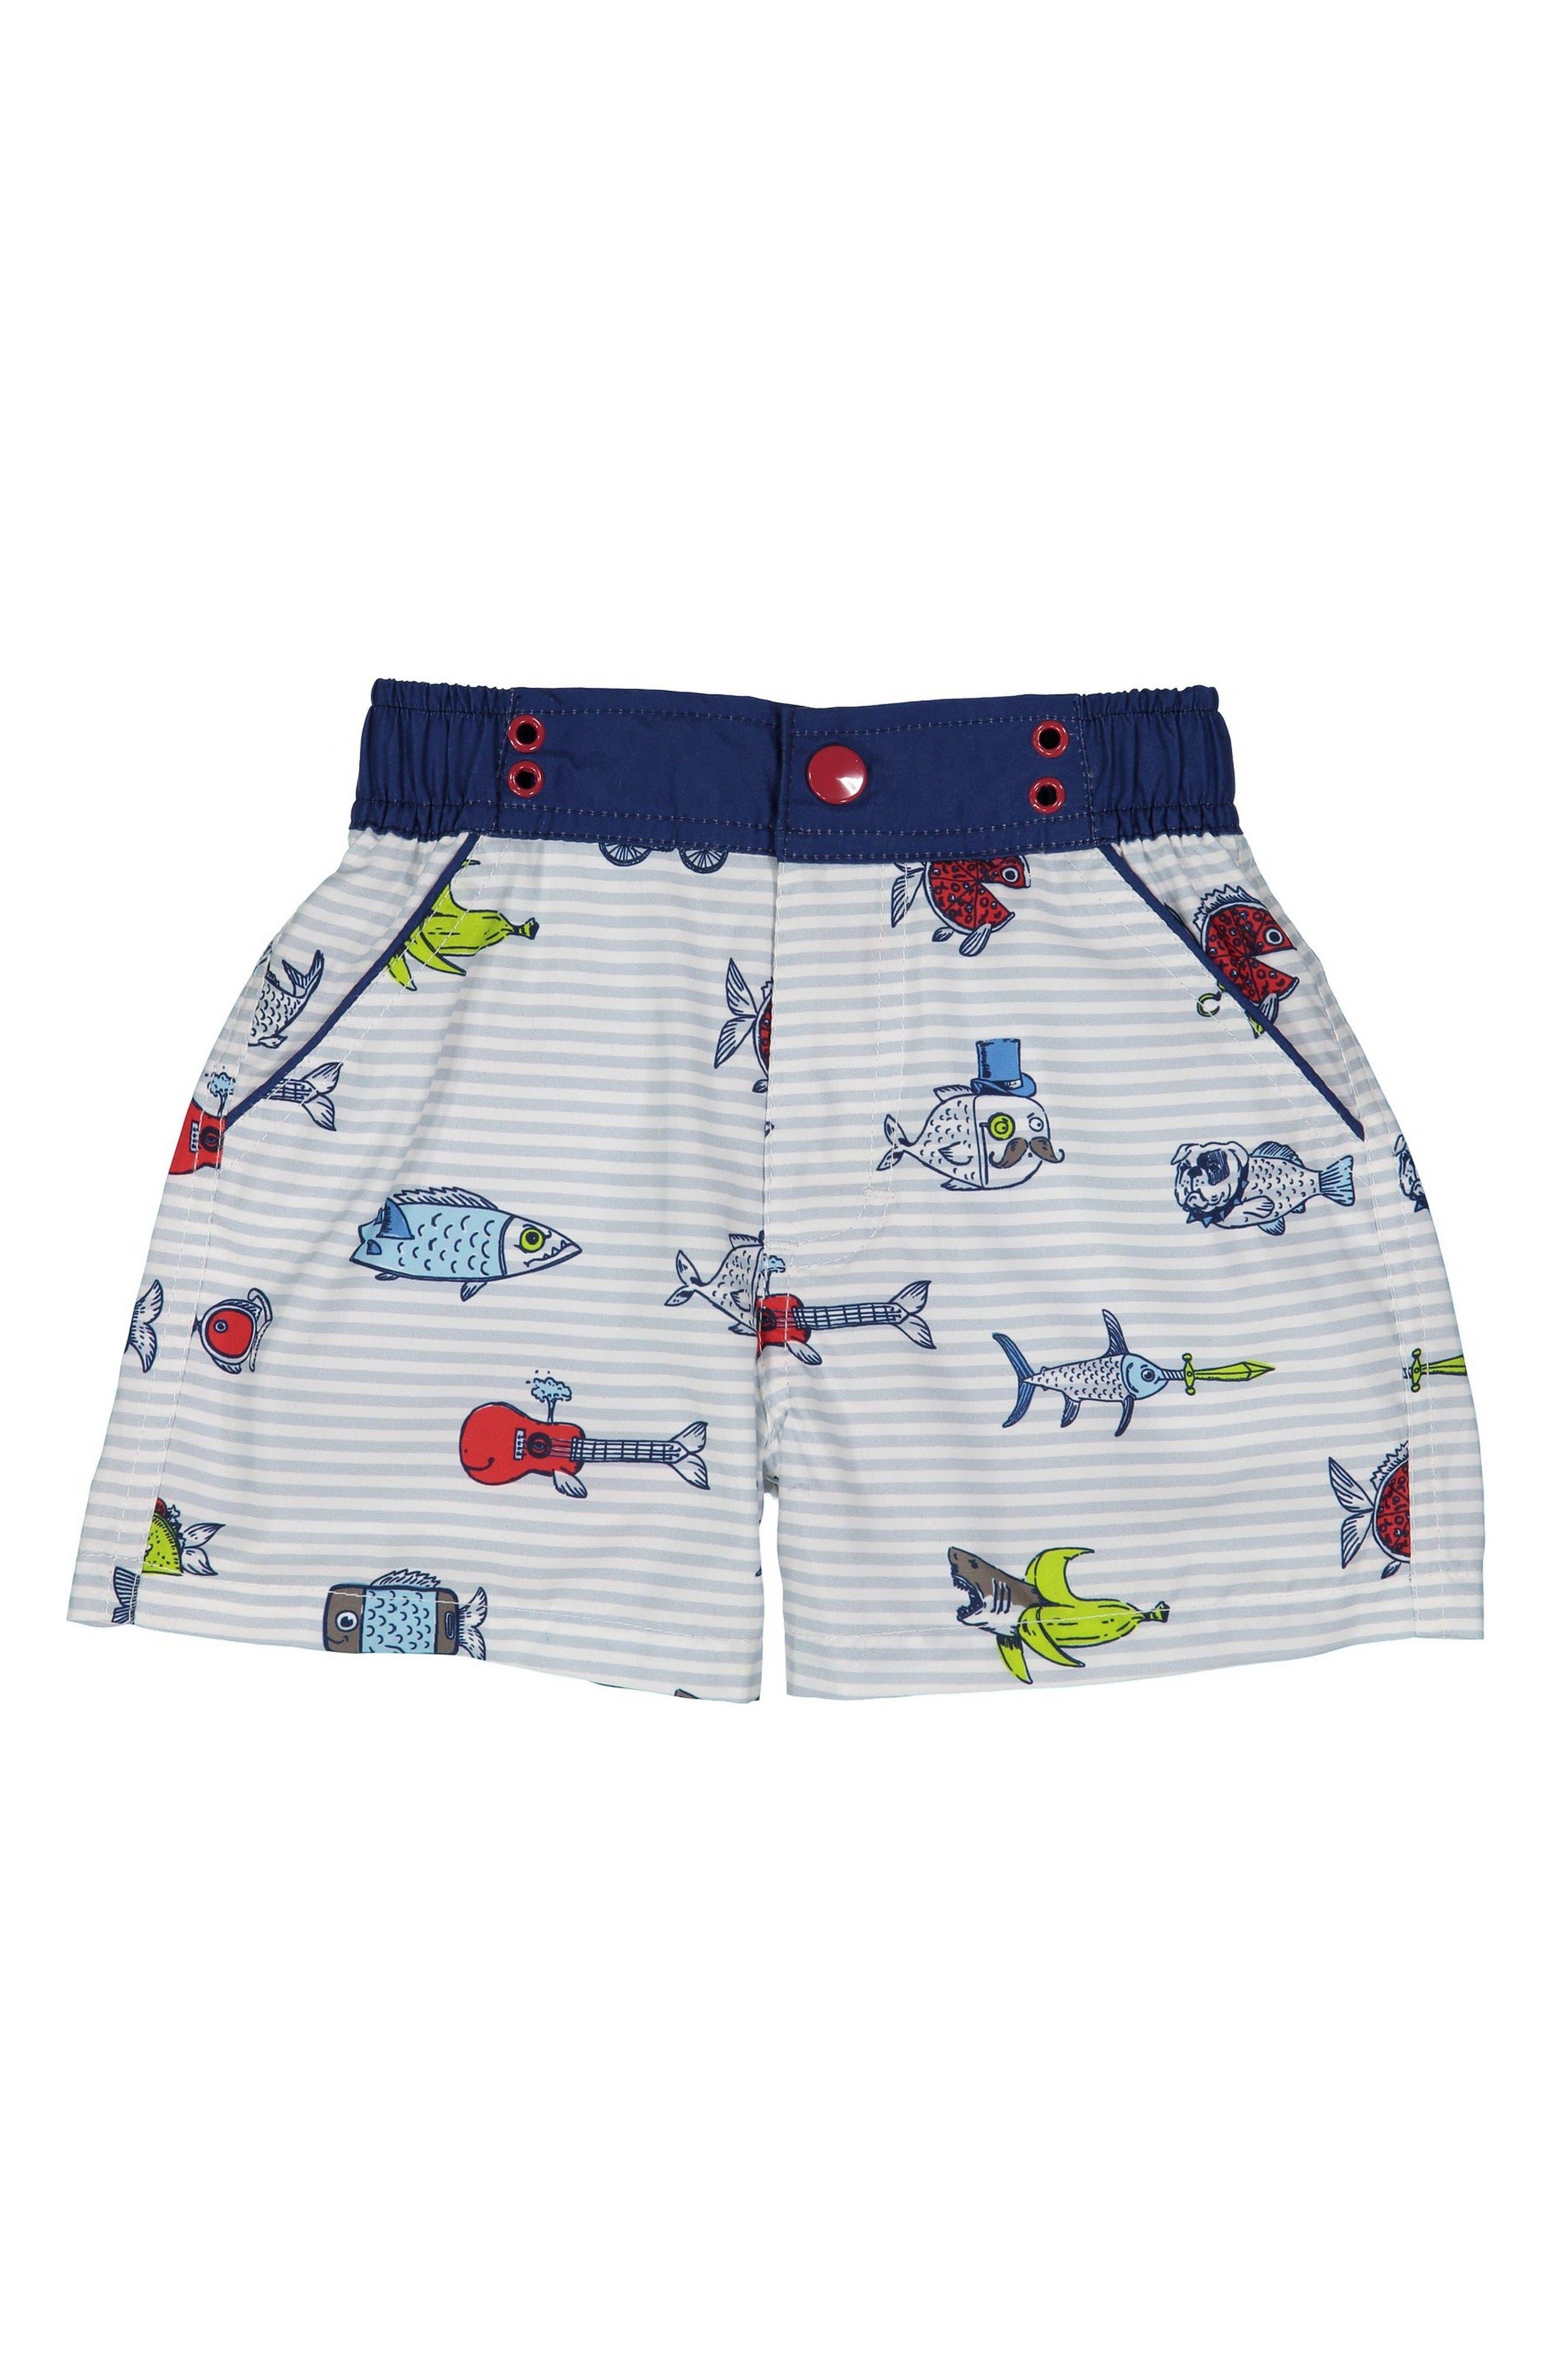 Andy & Evan Fish Swim Trunks (Toddler Boys & Little Boys)